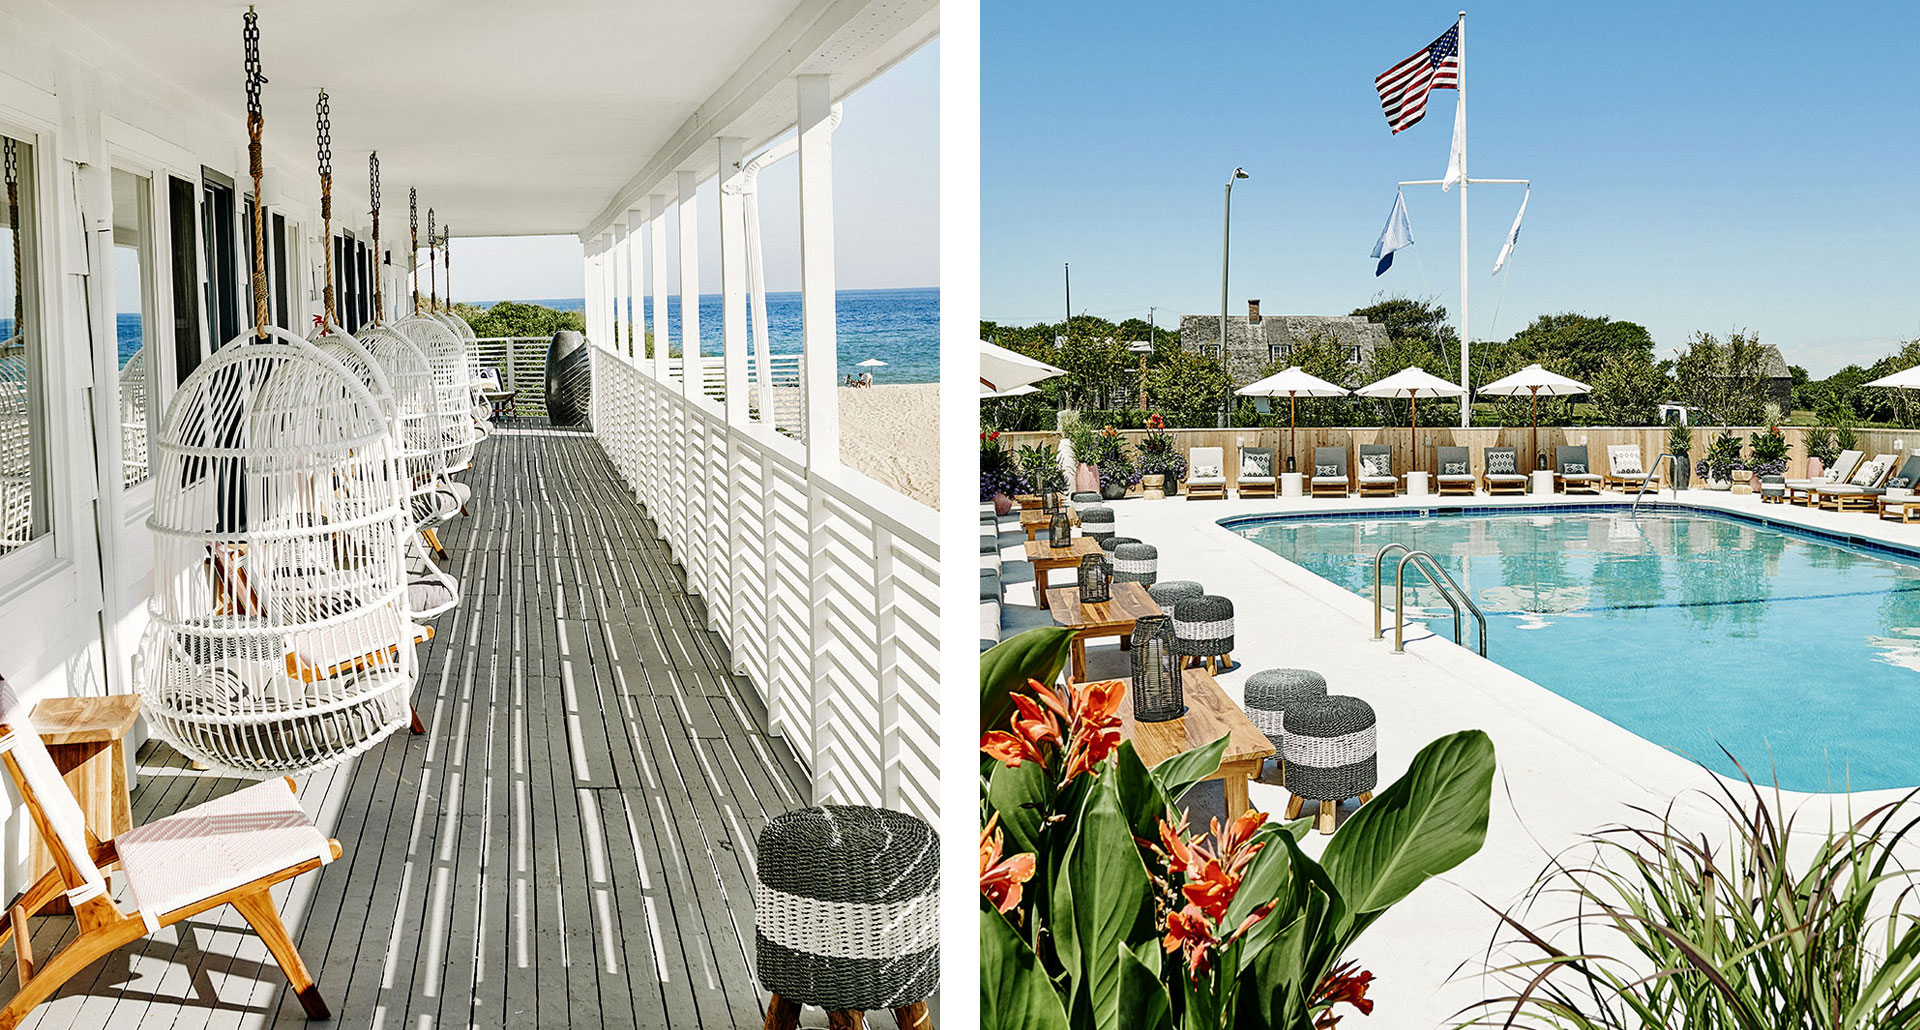 Hero Beach Club - boutique hotel in Montauk